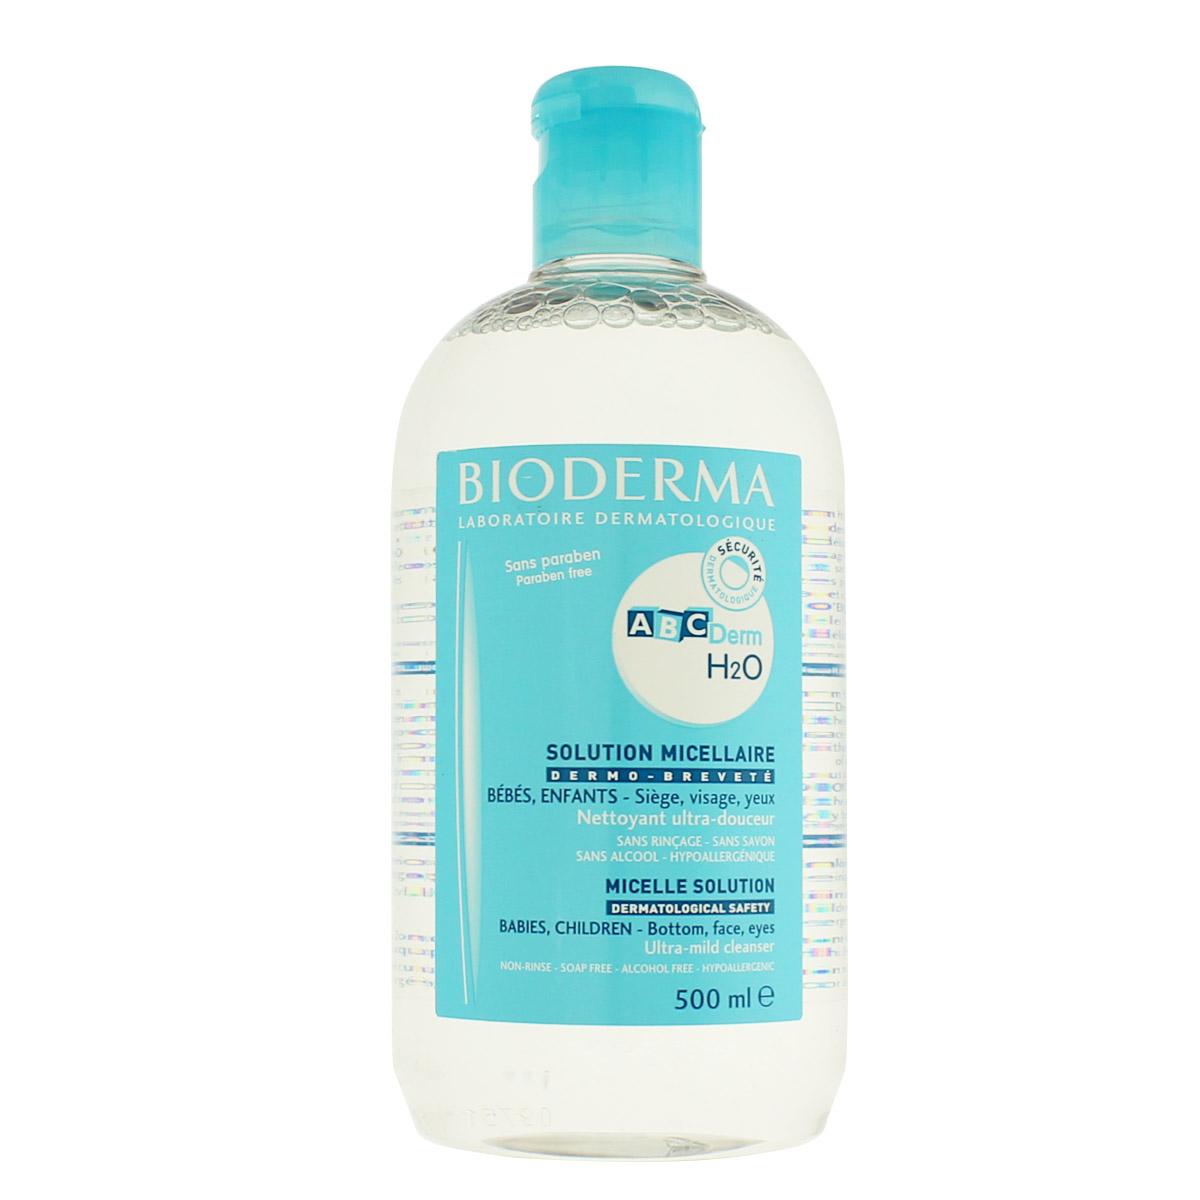 Bioderma ABCDerm H2O 500 ml 82473